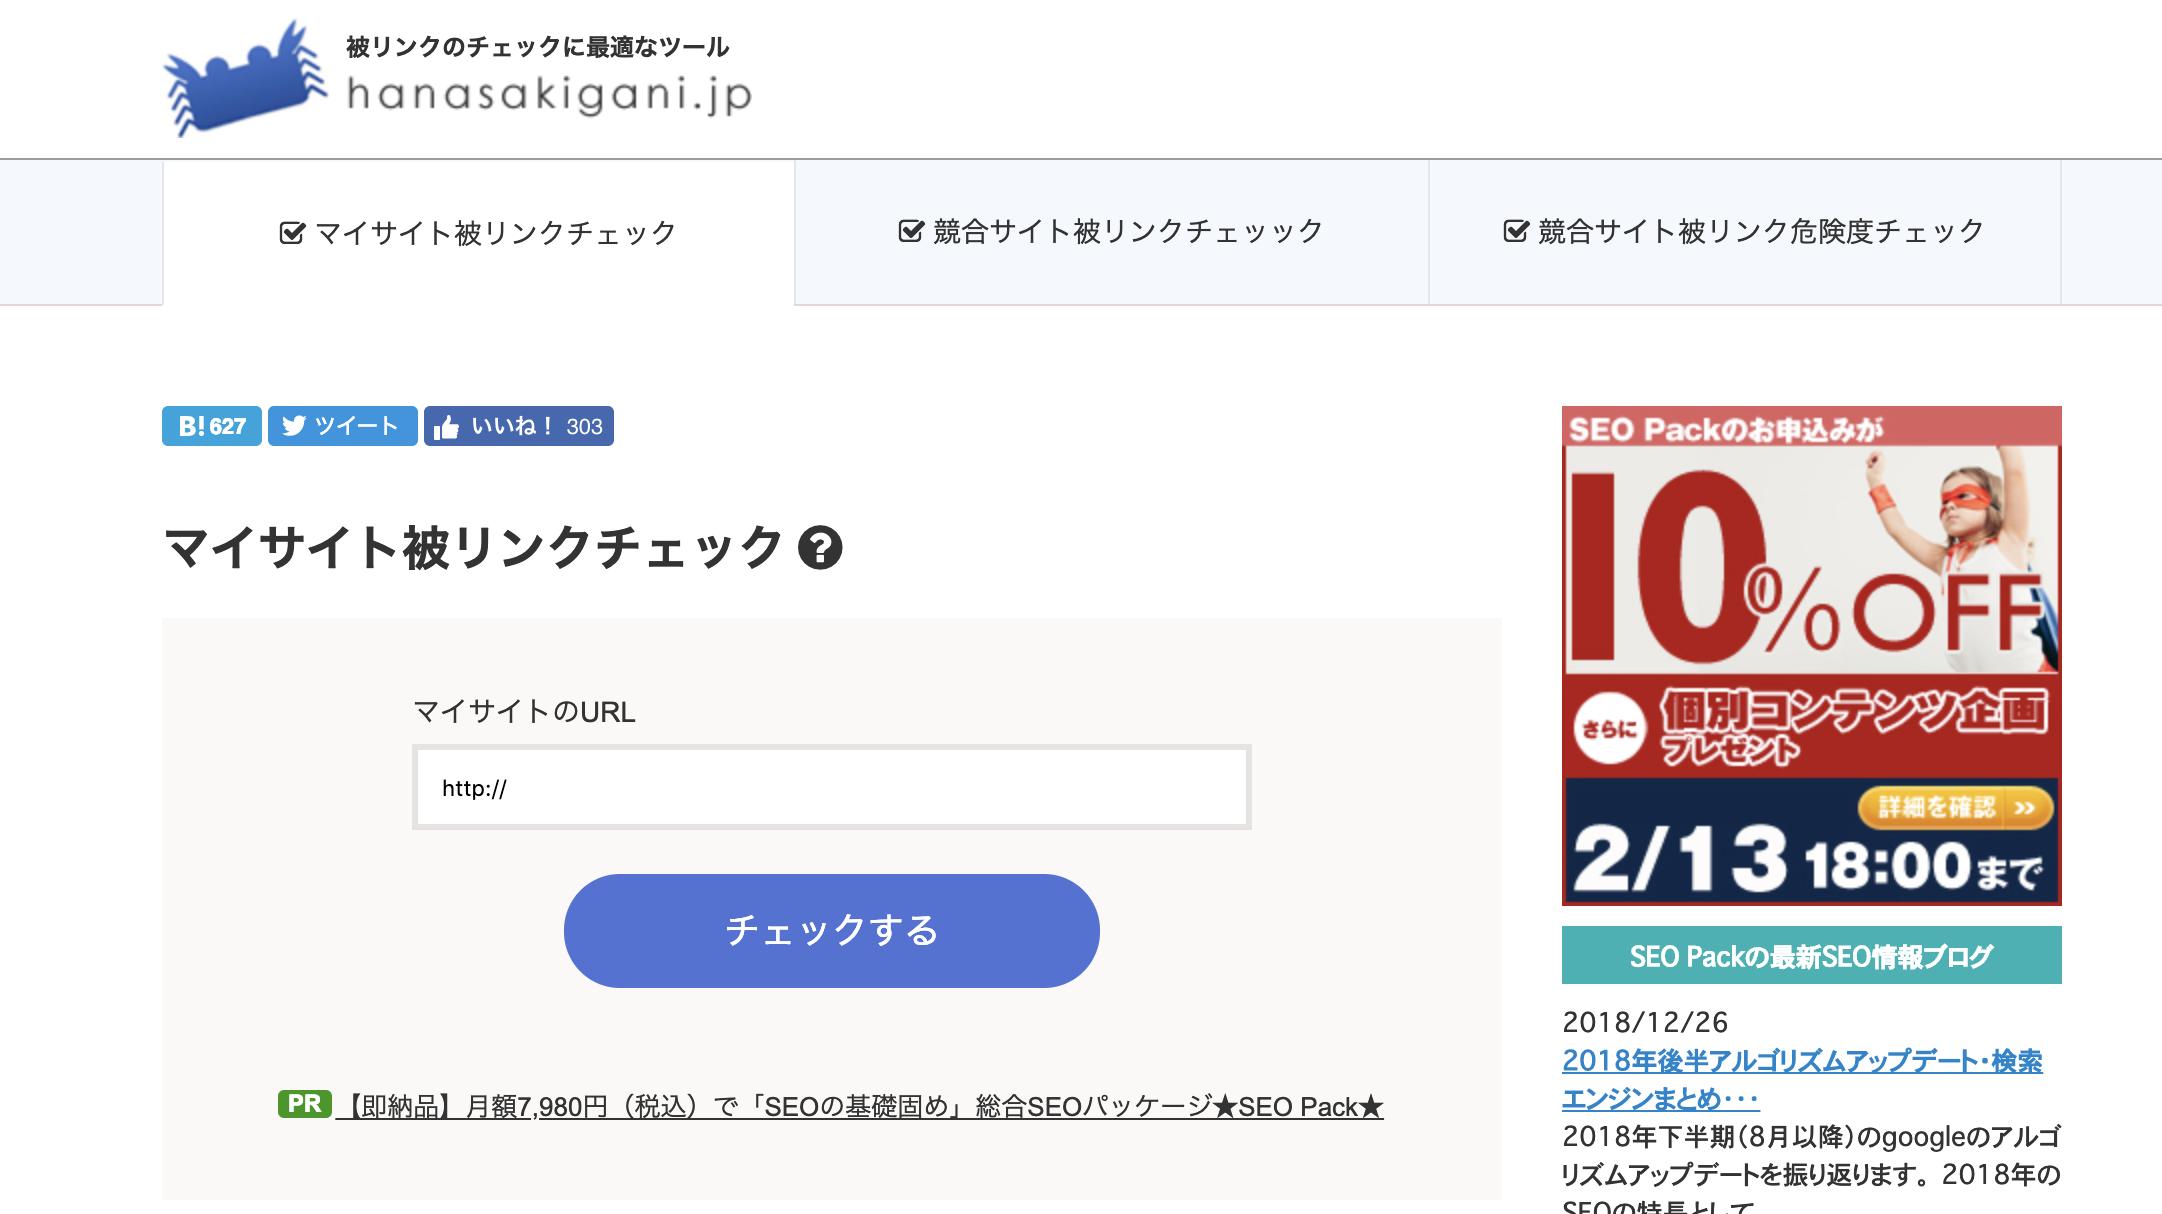 hanasakigani.jpサイト画像